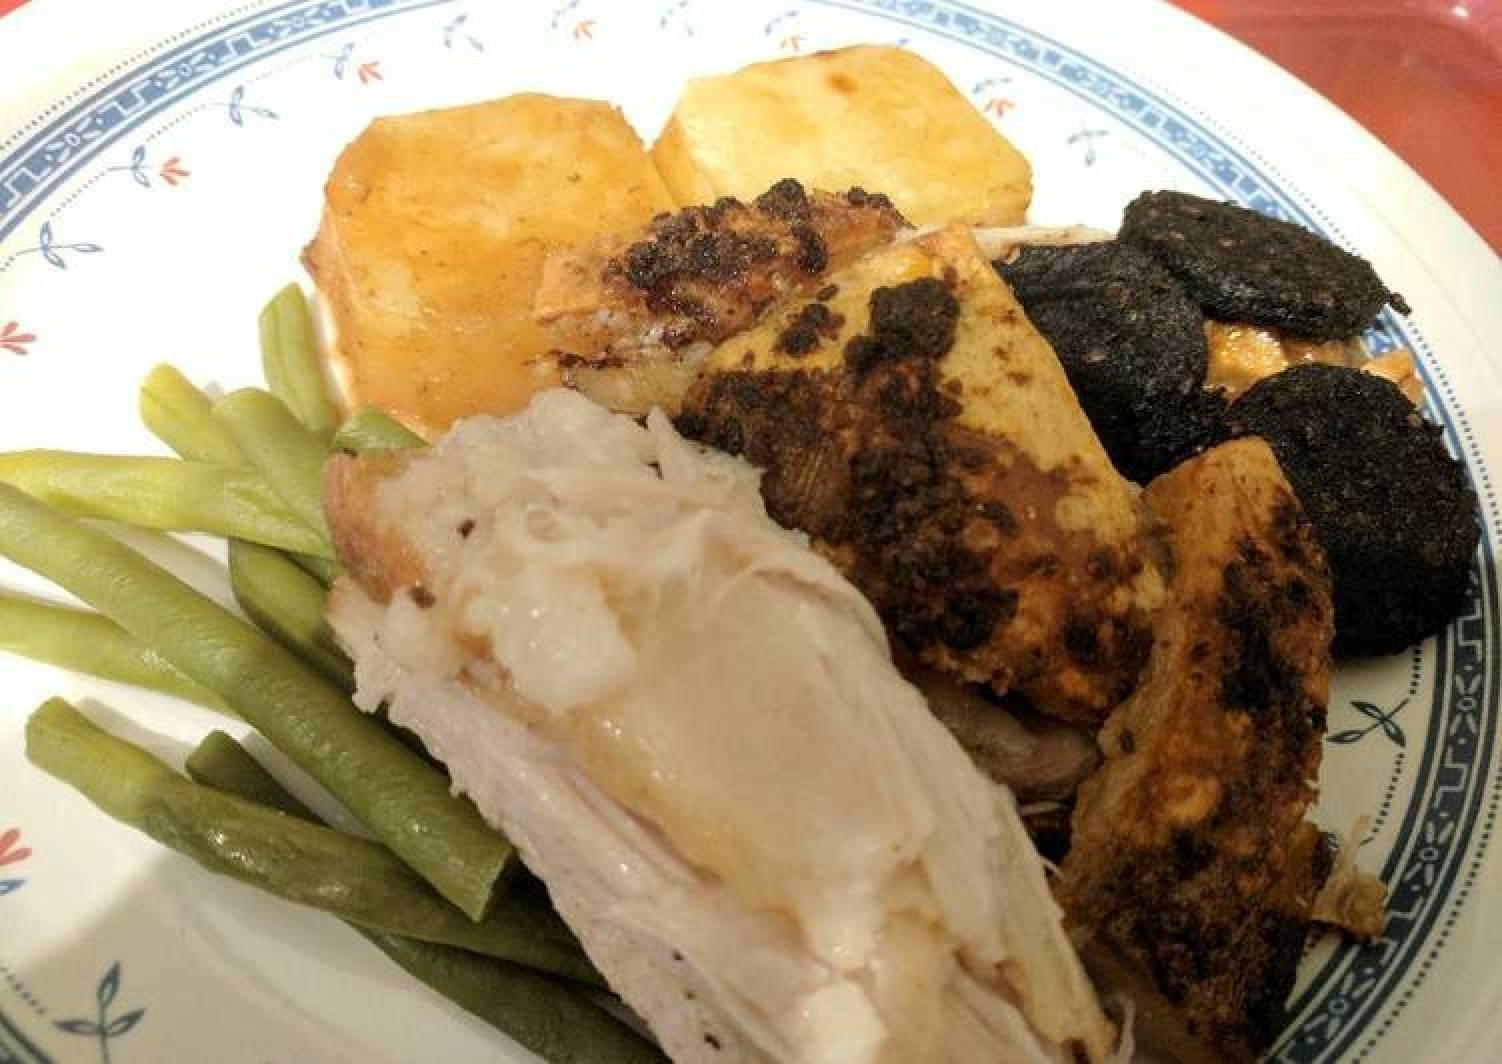 Pork Belly, Black pudding, potatoes, green beans & apple sauce